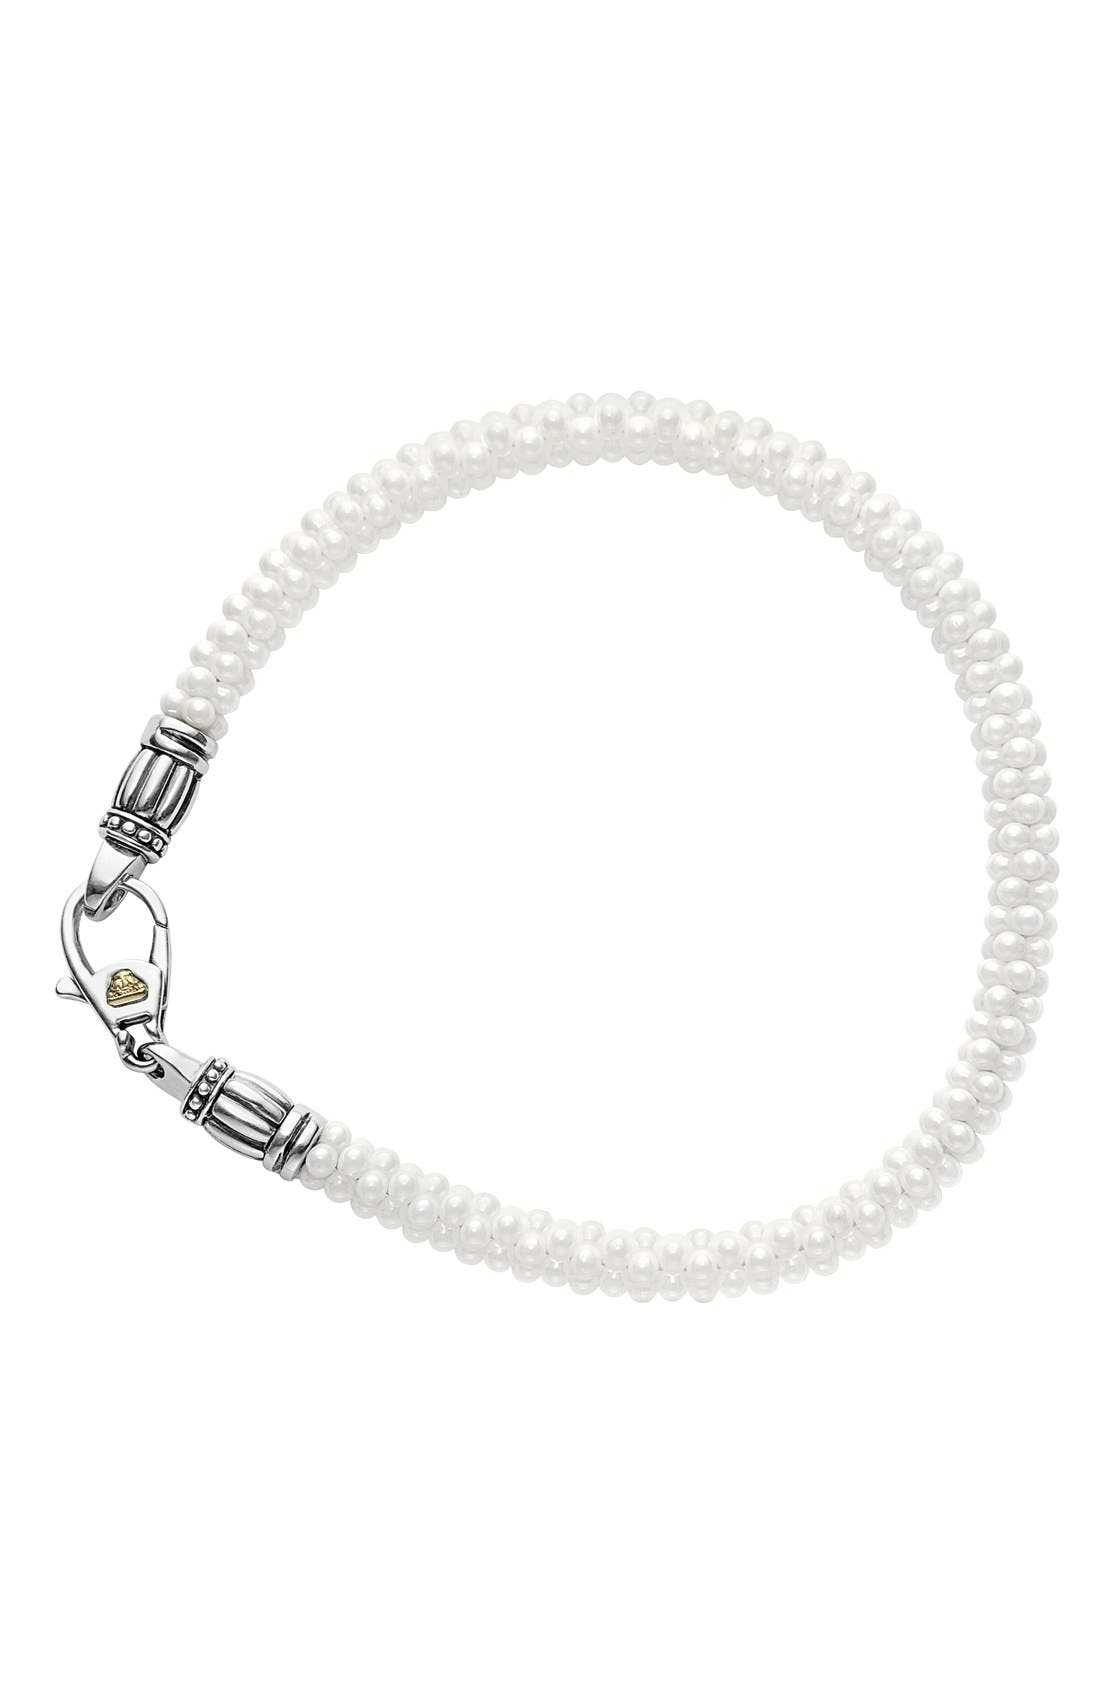 'Black & White Caviar' Bracelet,                             Alternate thumbnail 2, color,                             White/ Gold